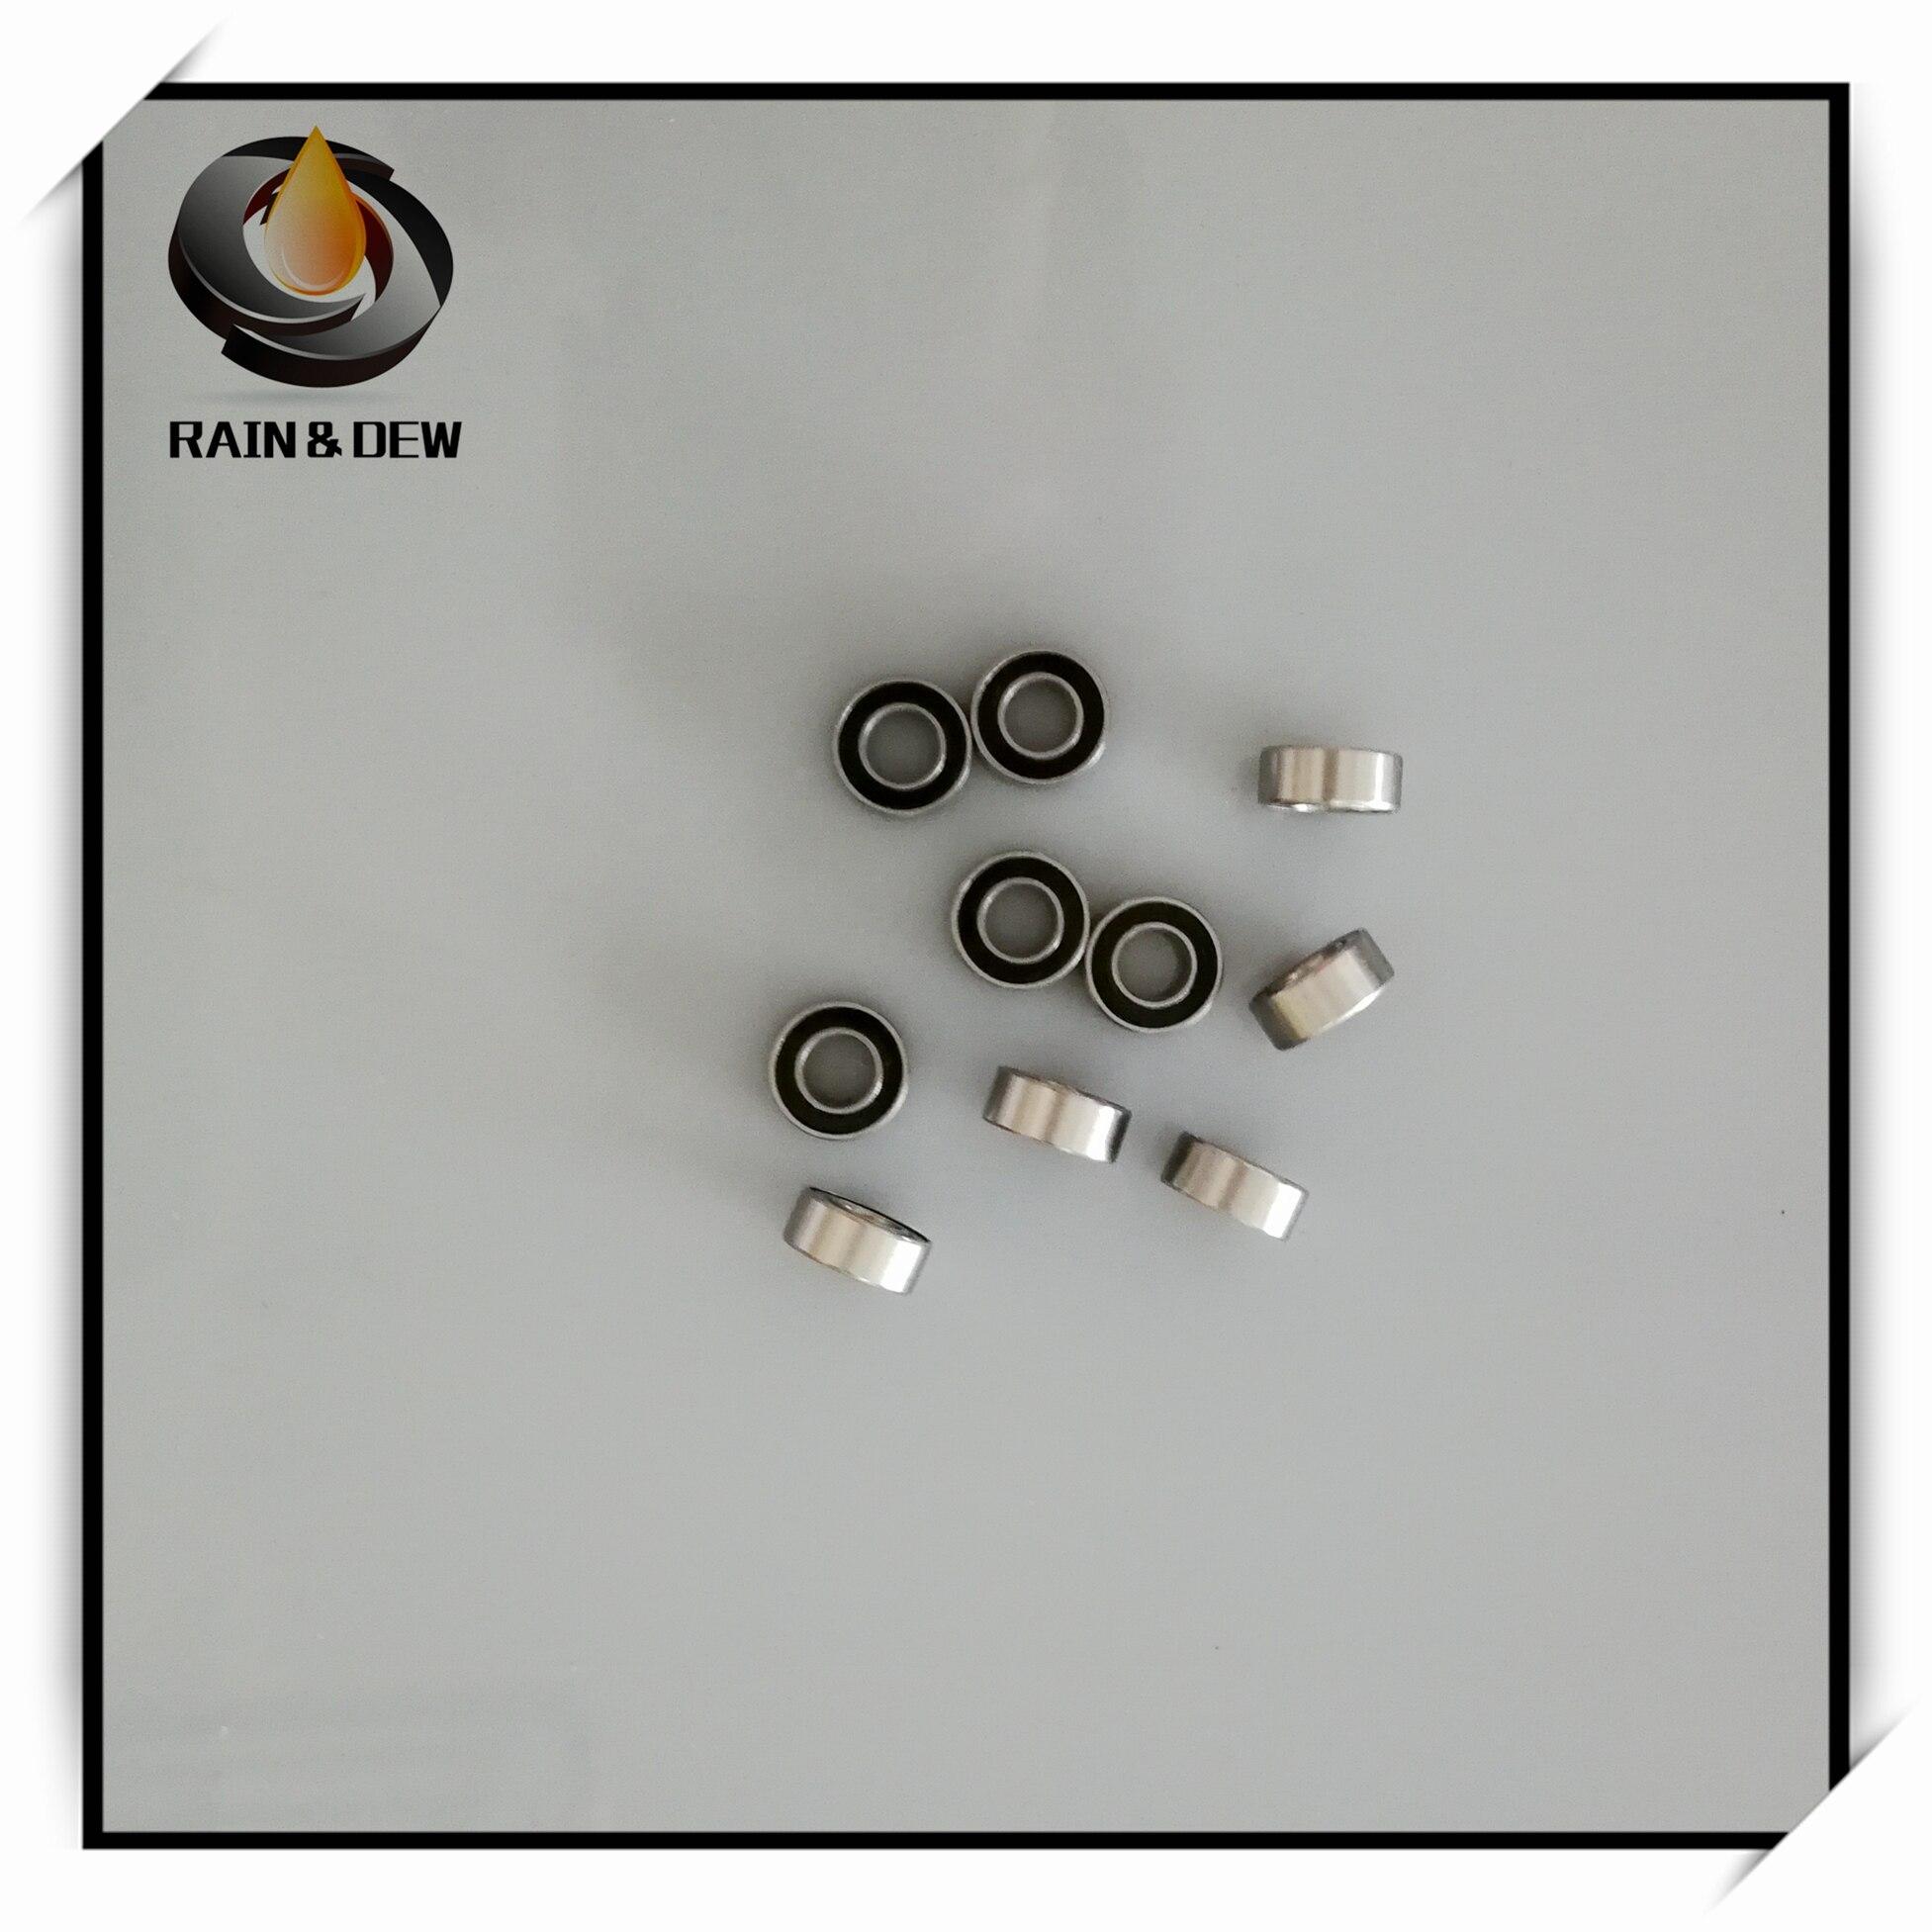 10 Pcs 5x9x3 Mm Ball Bearing SMR95 2RS   Stainless Steel Bearing SMR95-2RS ABEC-7 Anti-rust Bearing MR95 Miniature Ball Bearing